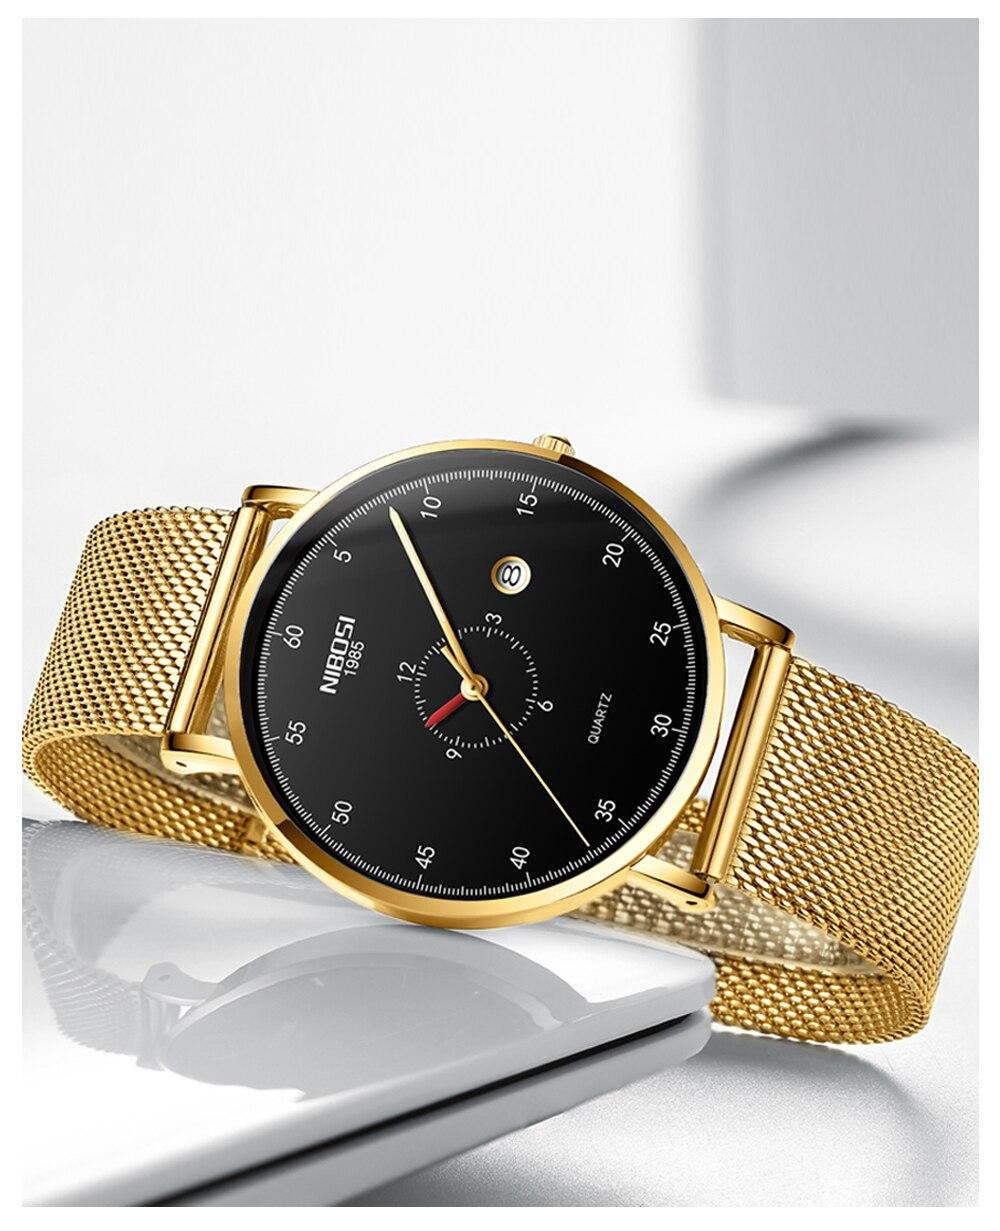 Erkek Kol Saati NIBOSI Men Watch Women Top Brand Luxury 2019 Thin Watches For Men Waterproof Black Wristwatch Female (12)